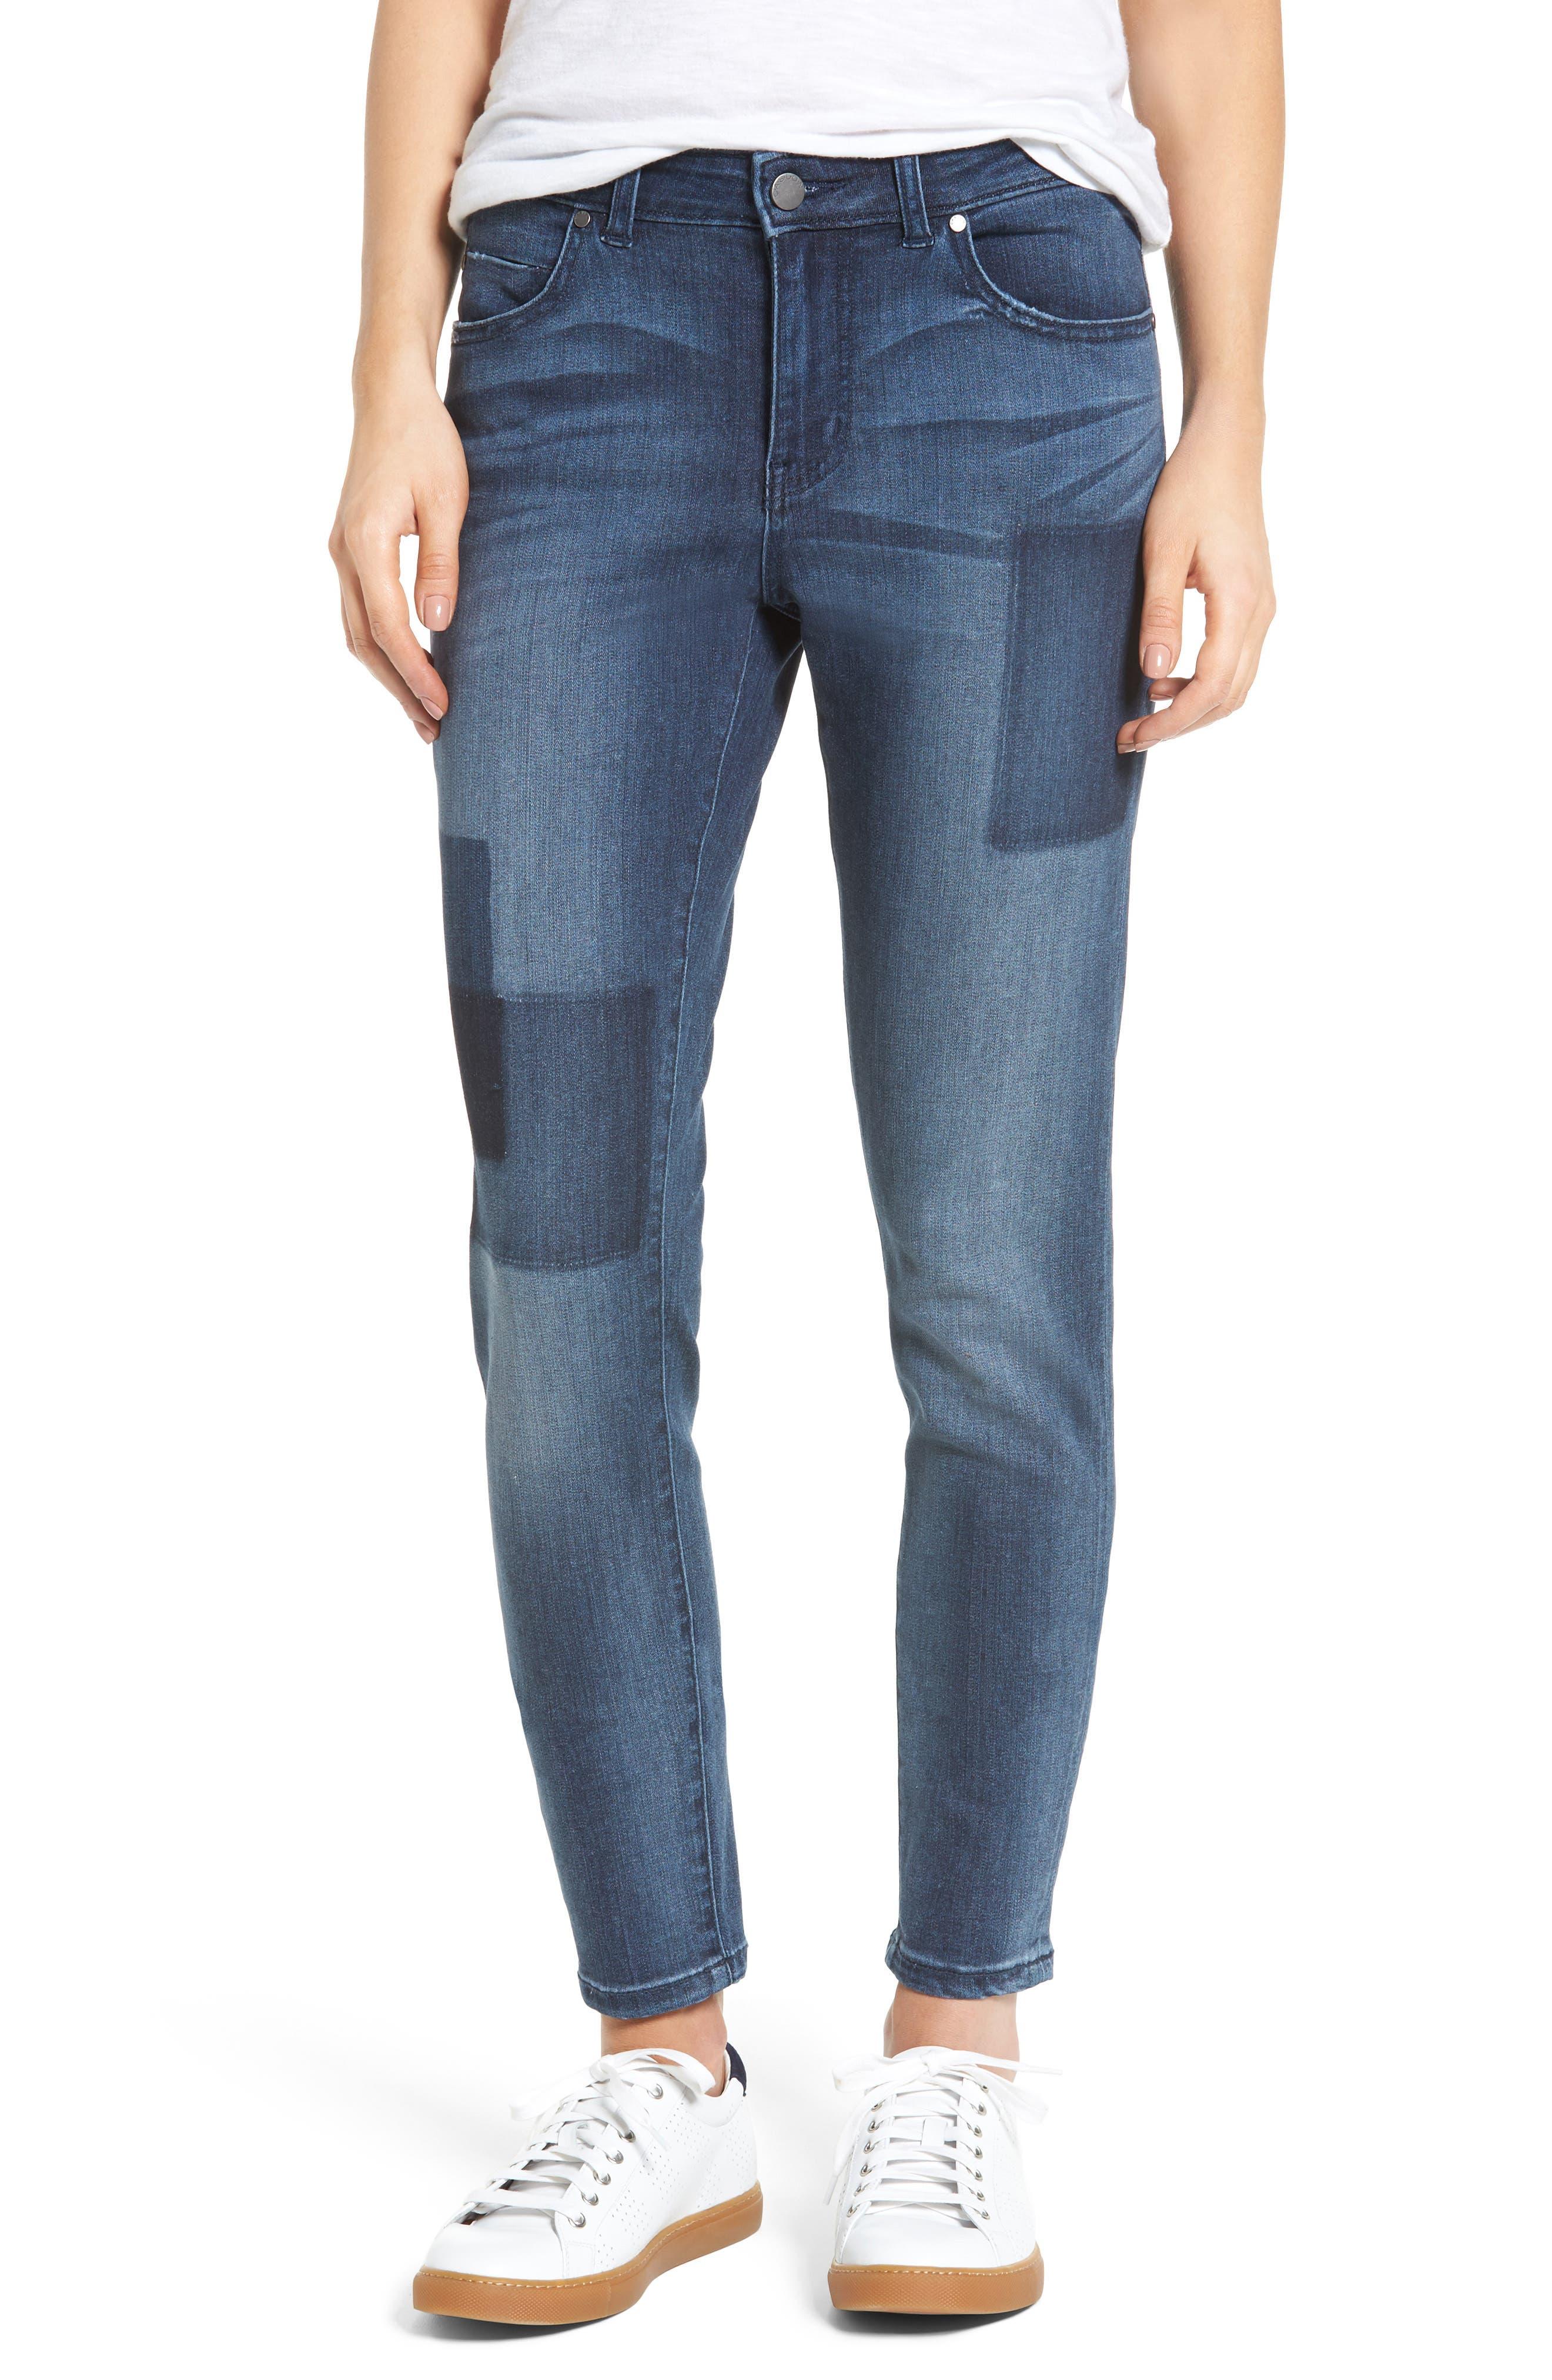 Alternate Image 1 Selected - Caslon® Patchwork Skinny Jeans (Regular & Petite)